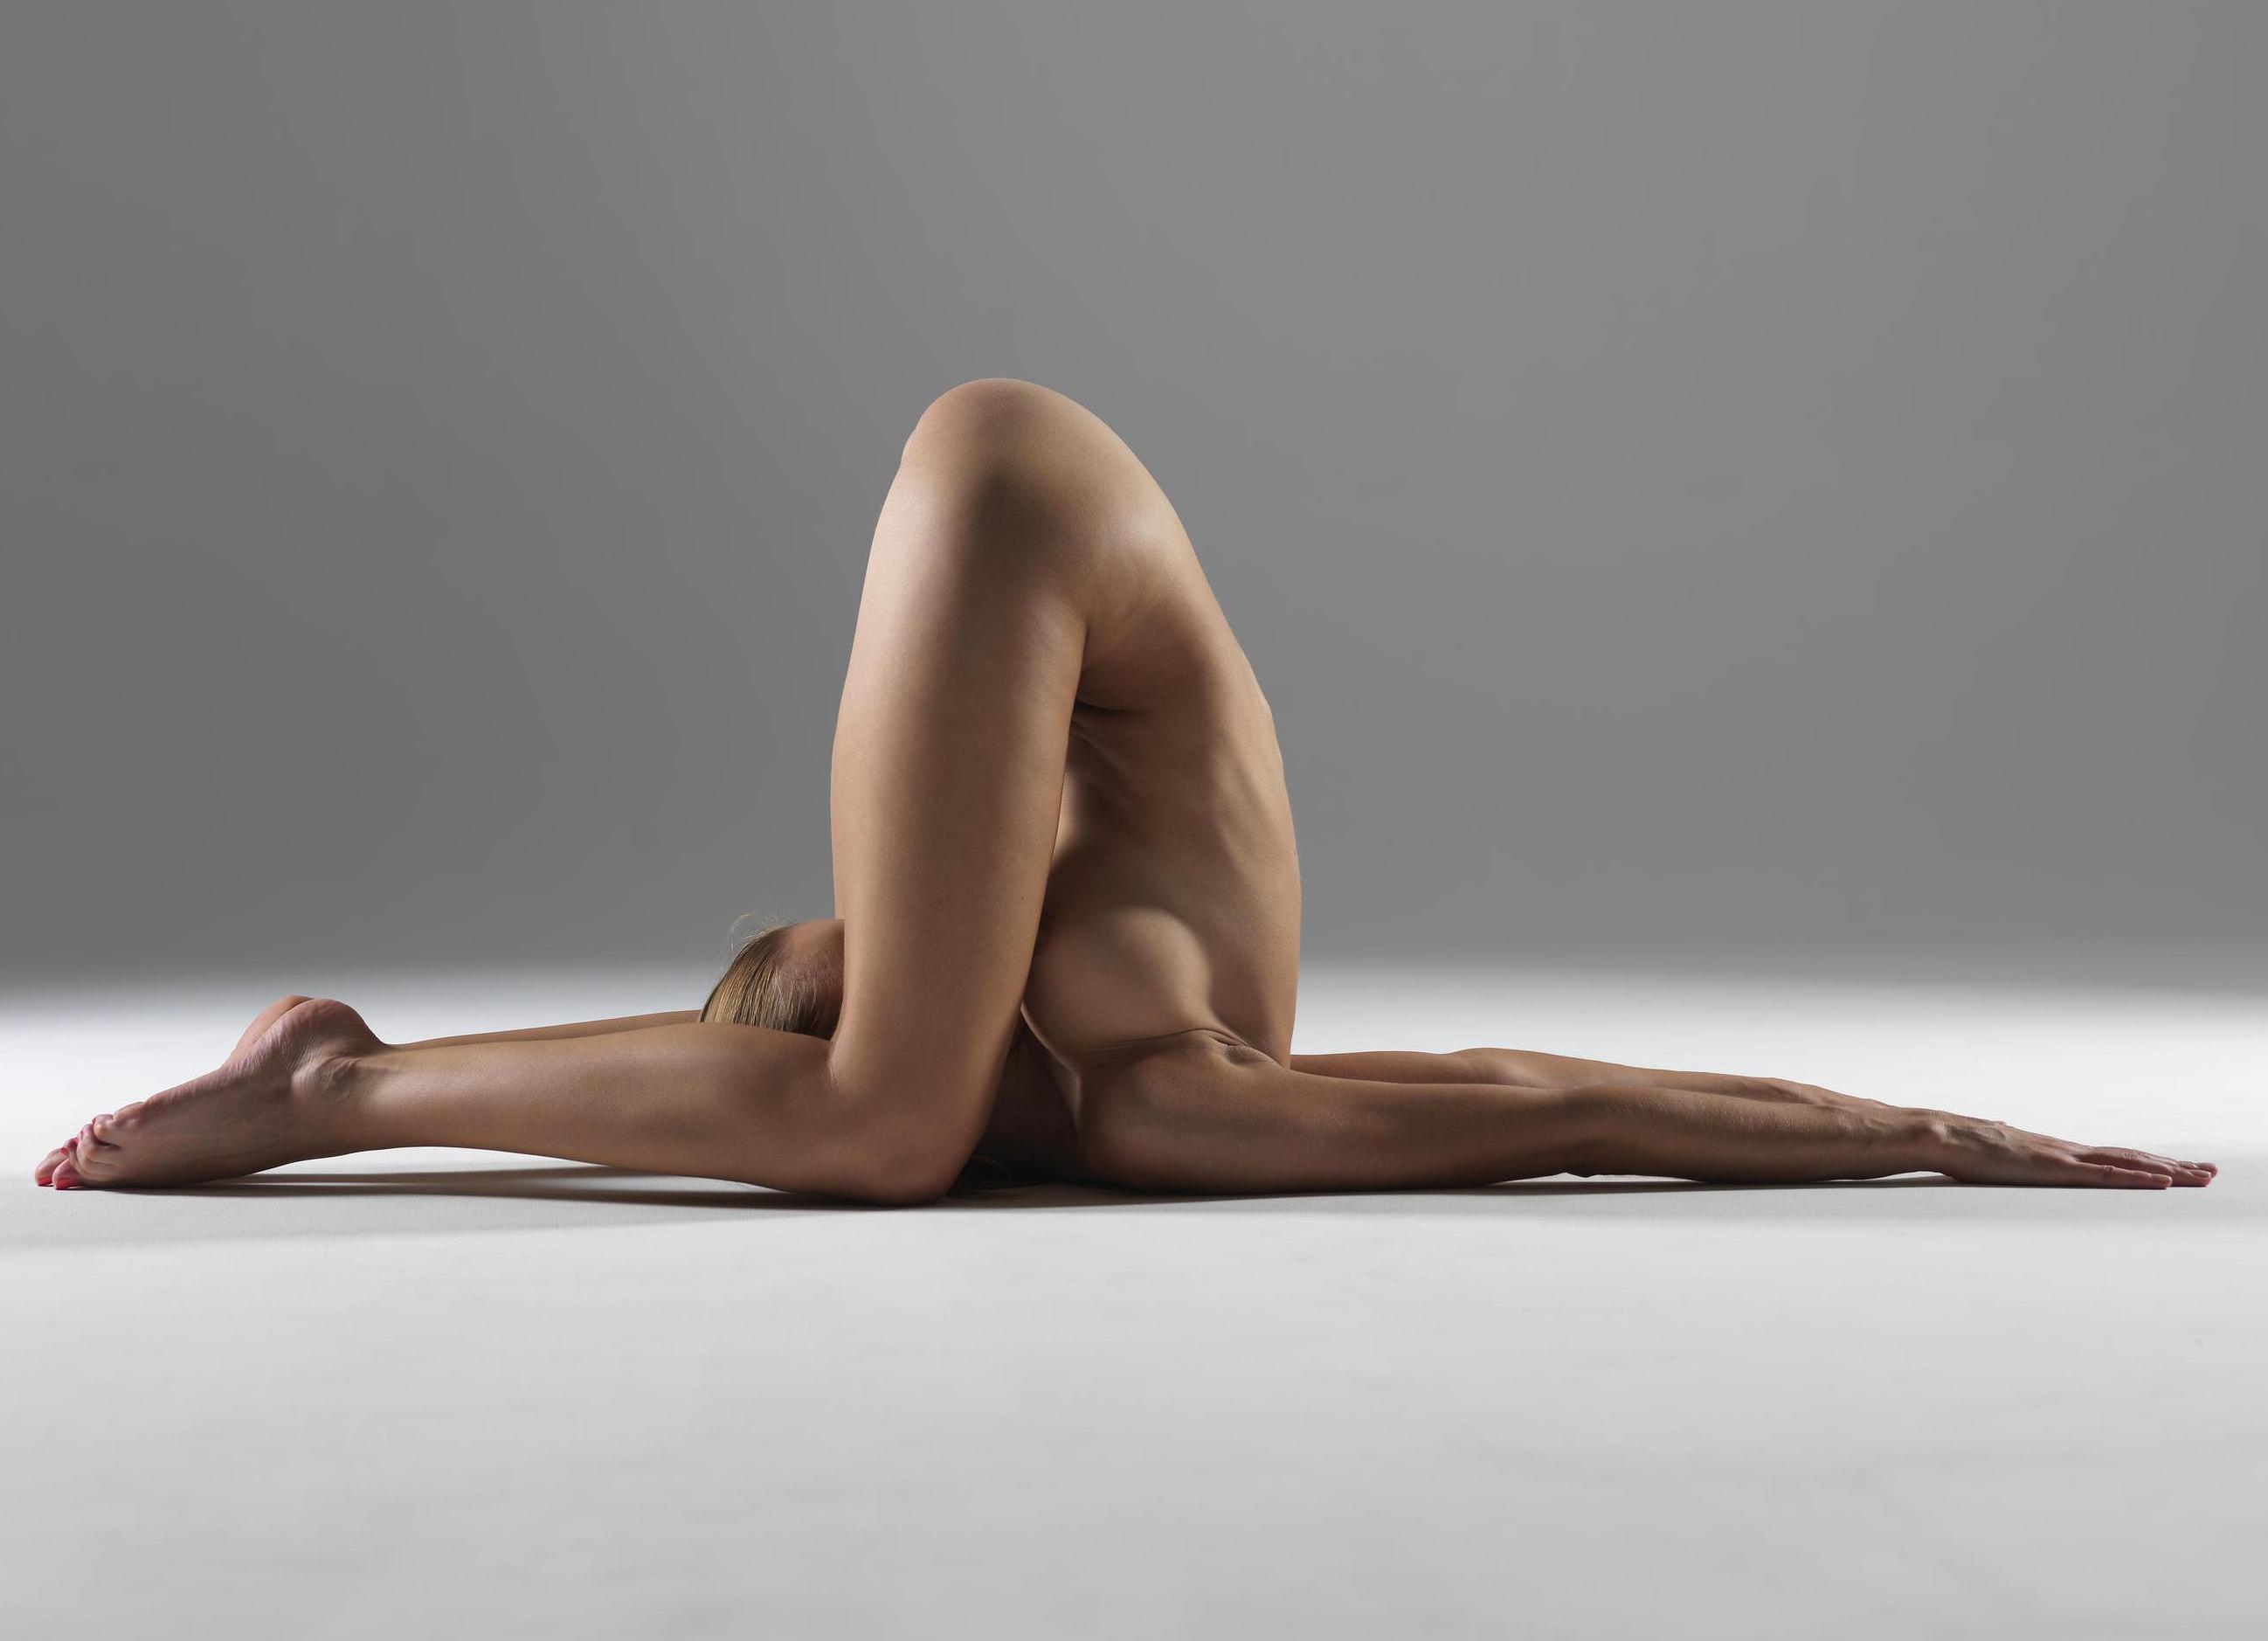 yoganude